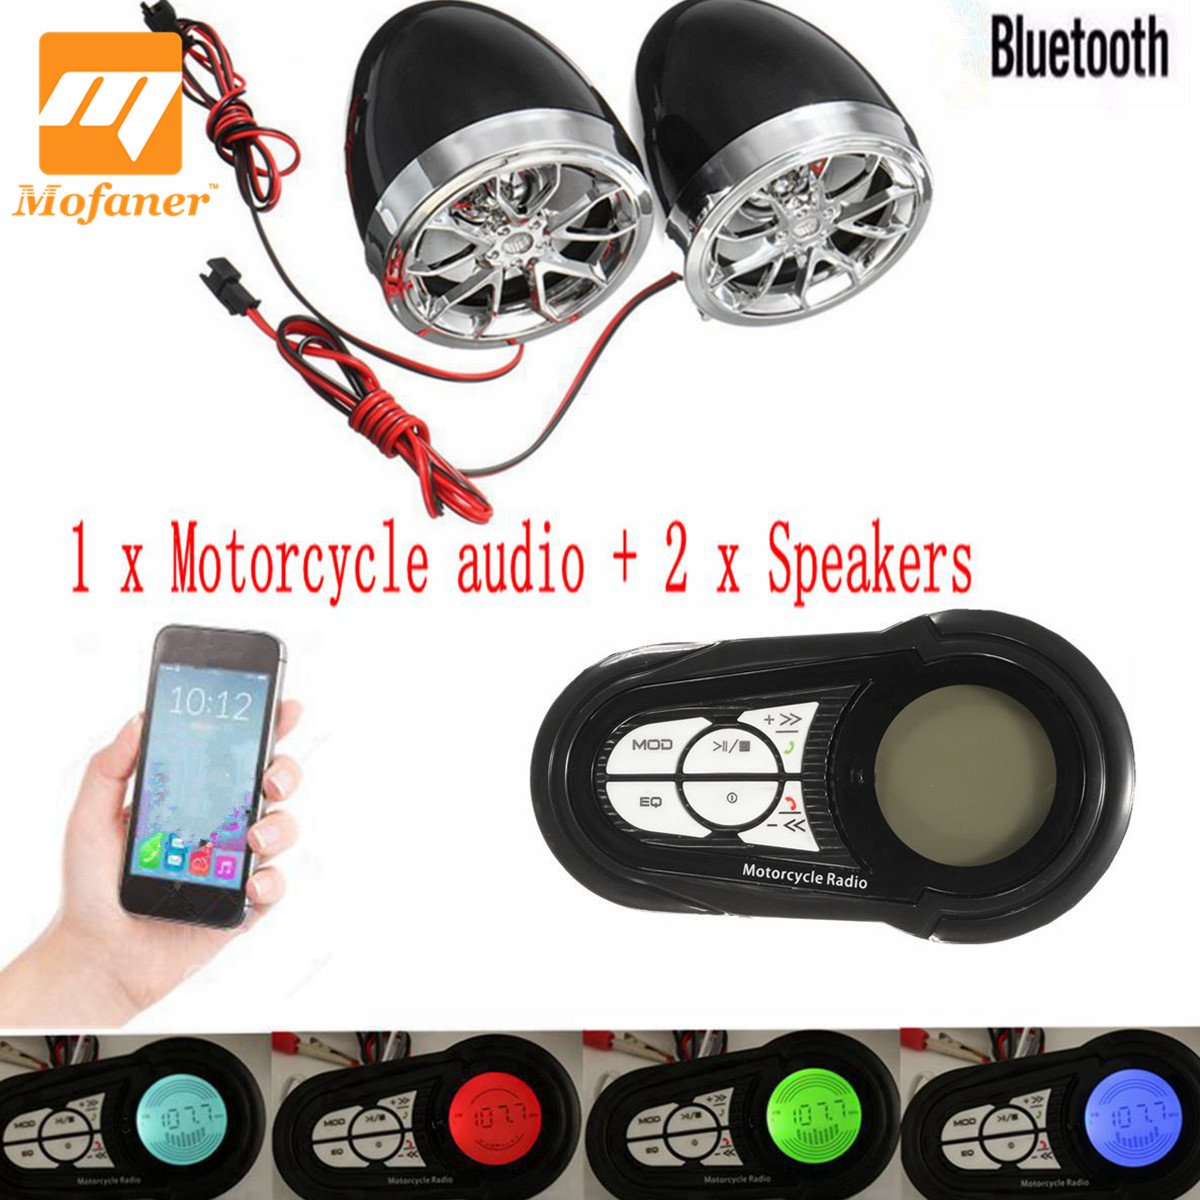 Mofaner Motorcycle Scooter Alarm Bluetooth Handfree Audio System FM Radio Stereo Amplifier Speaker Motorbike Anti-Mheft Device